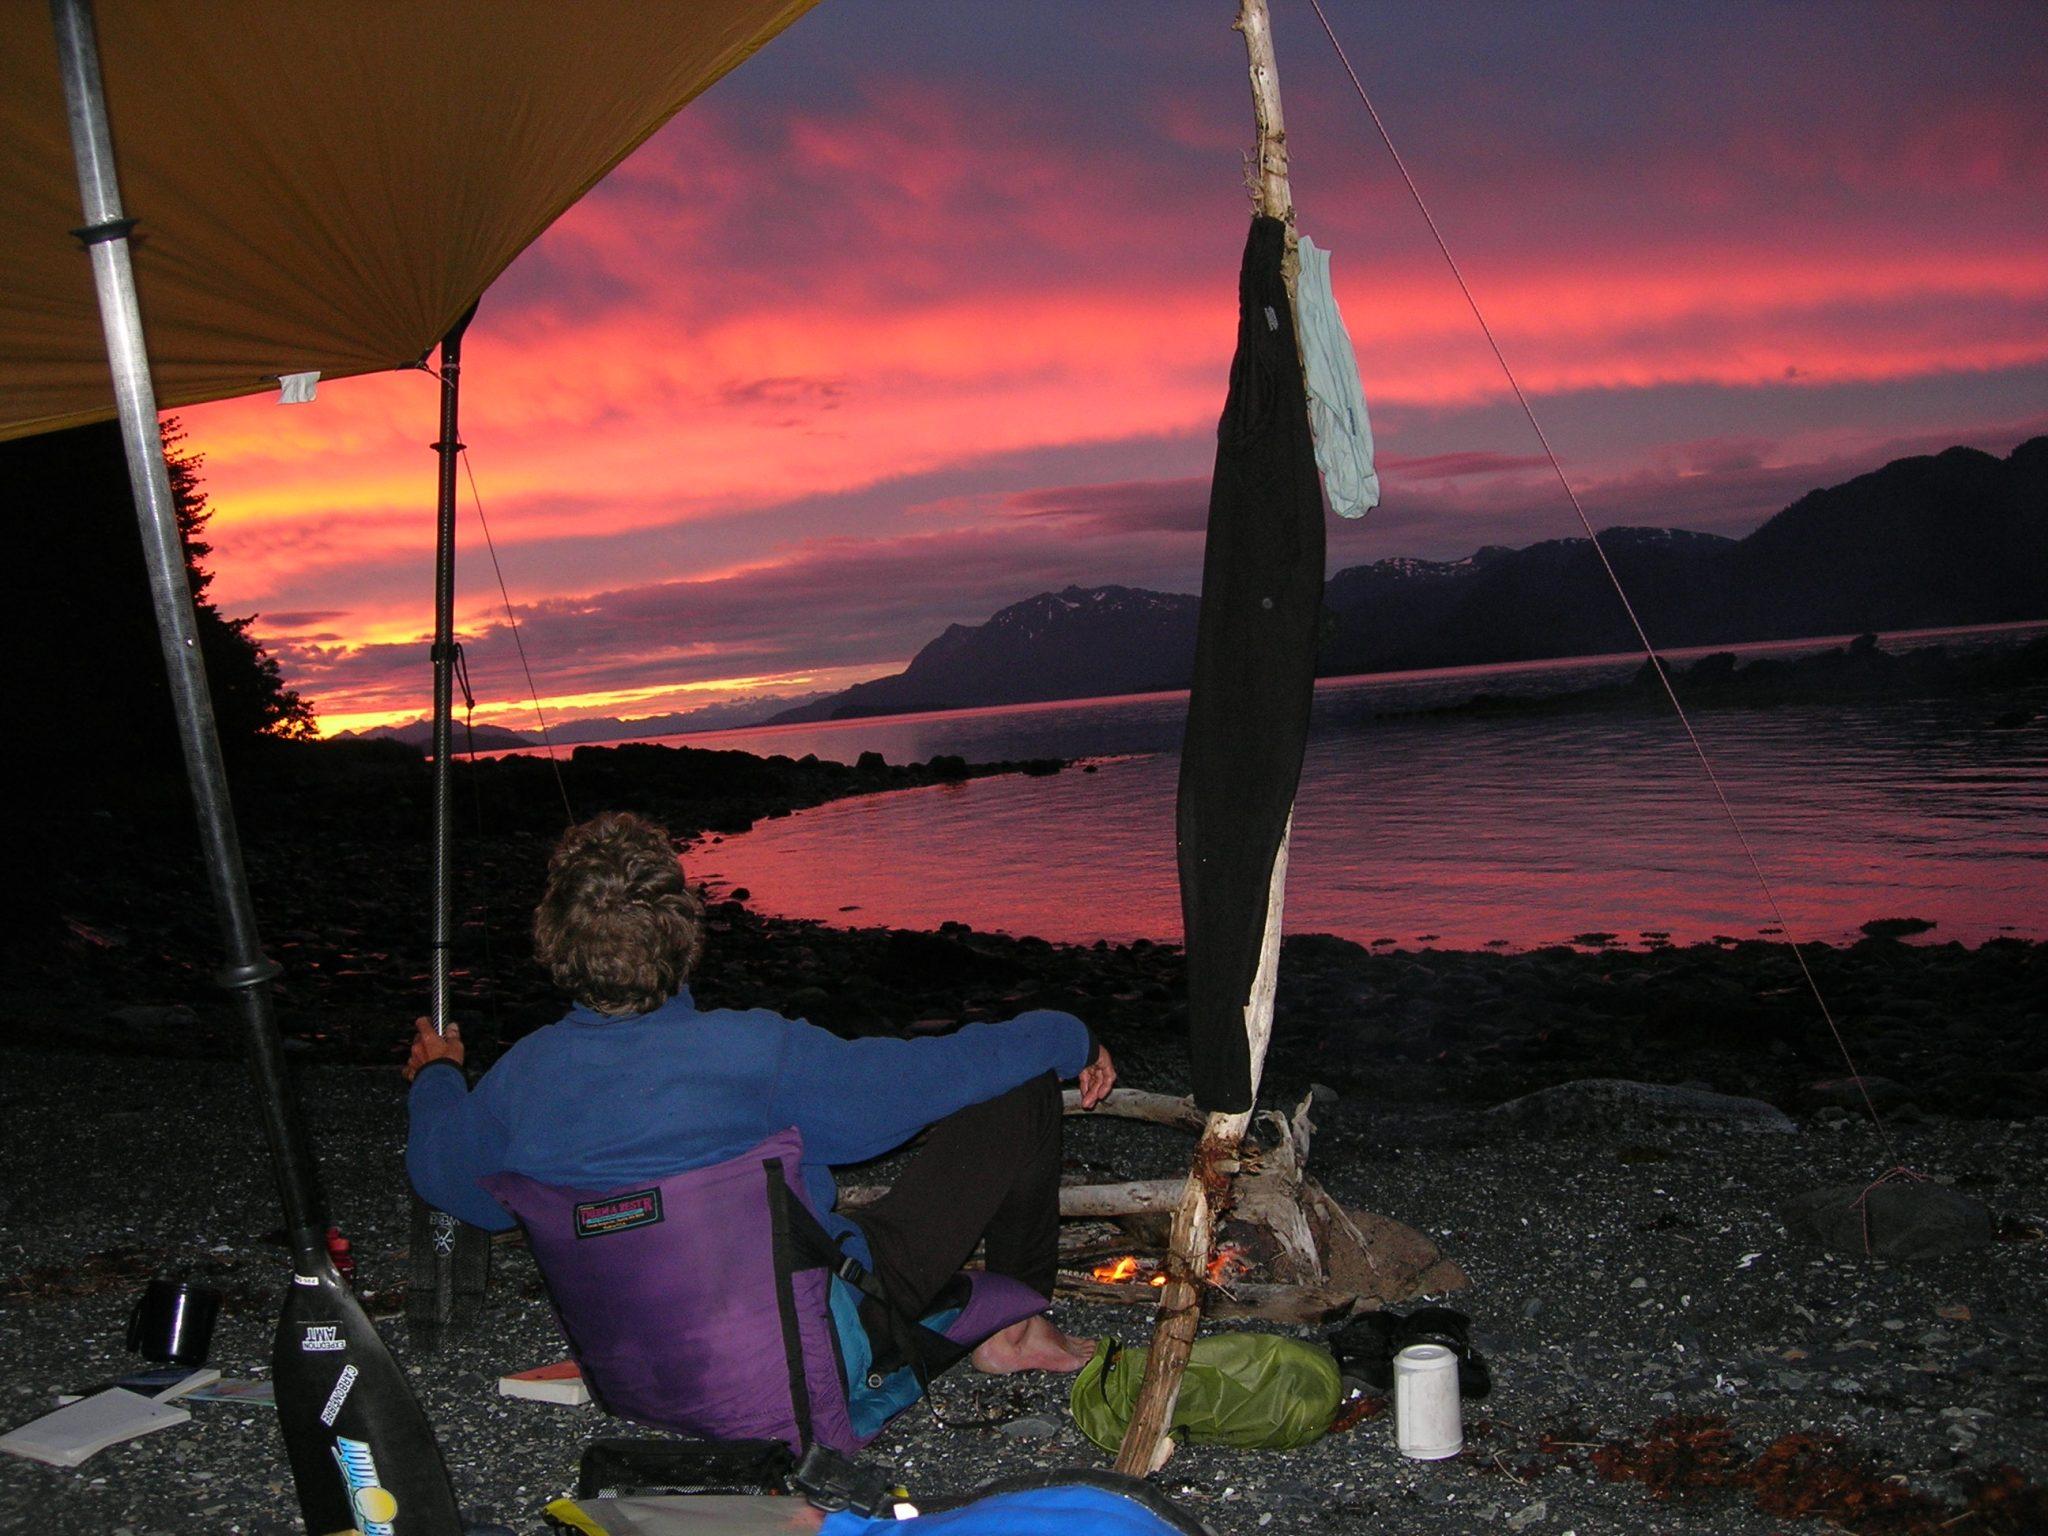 Sea Kayaking: Top 7 Gear Items for Sleeping & Resting